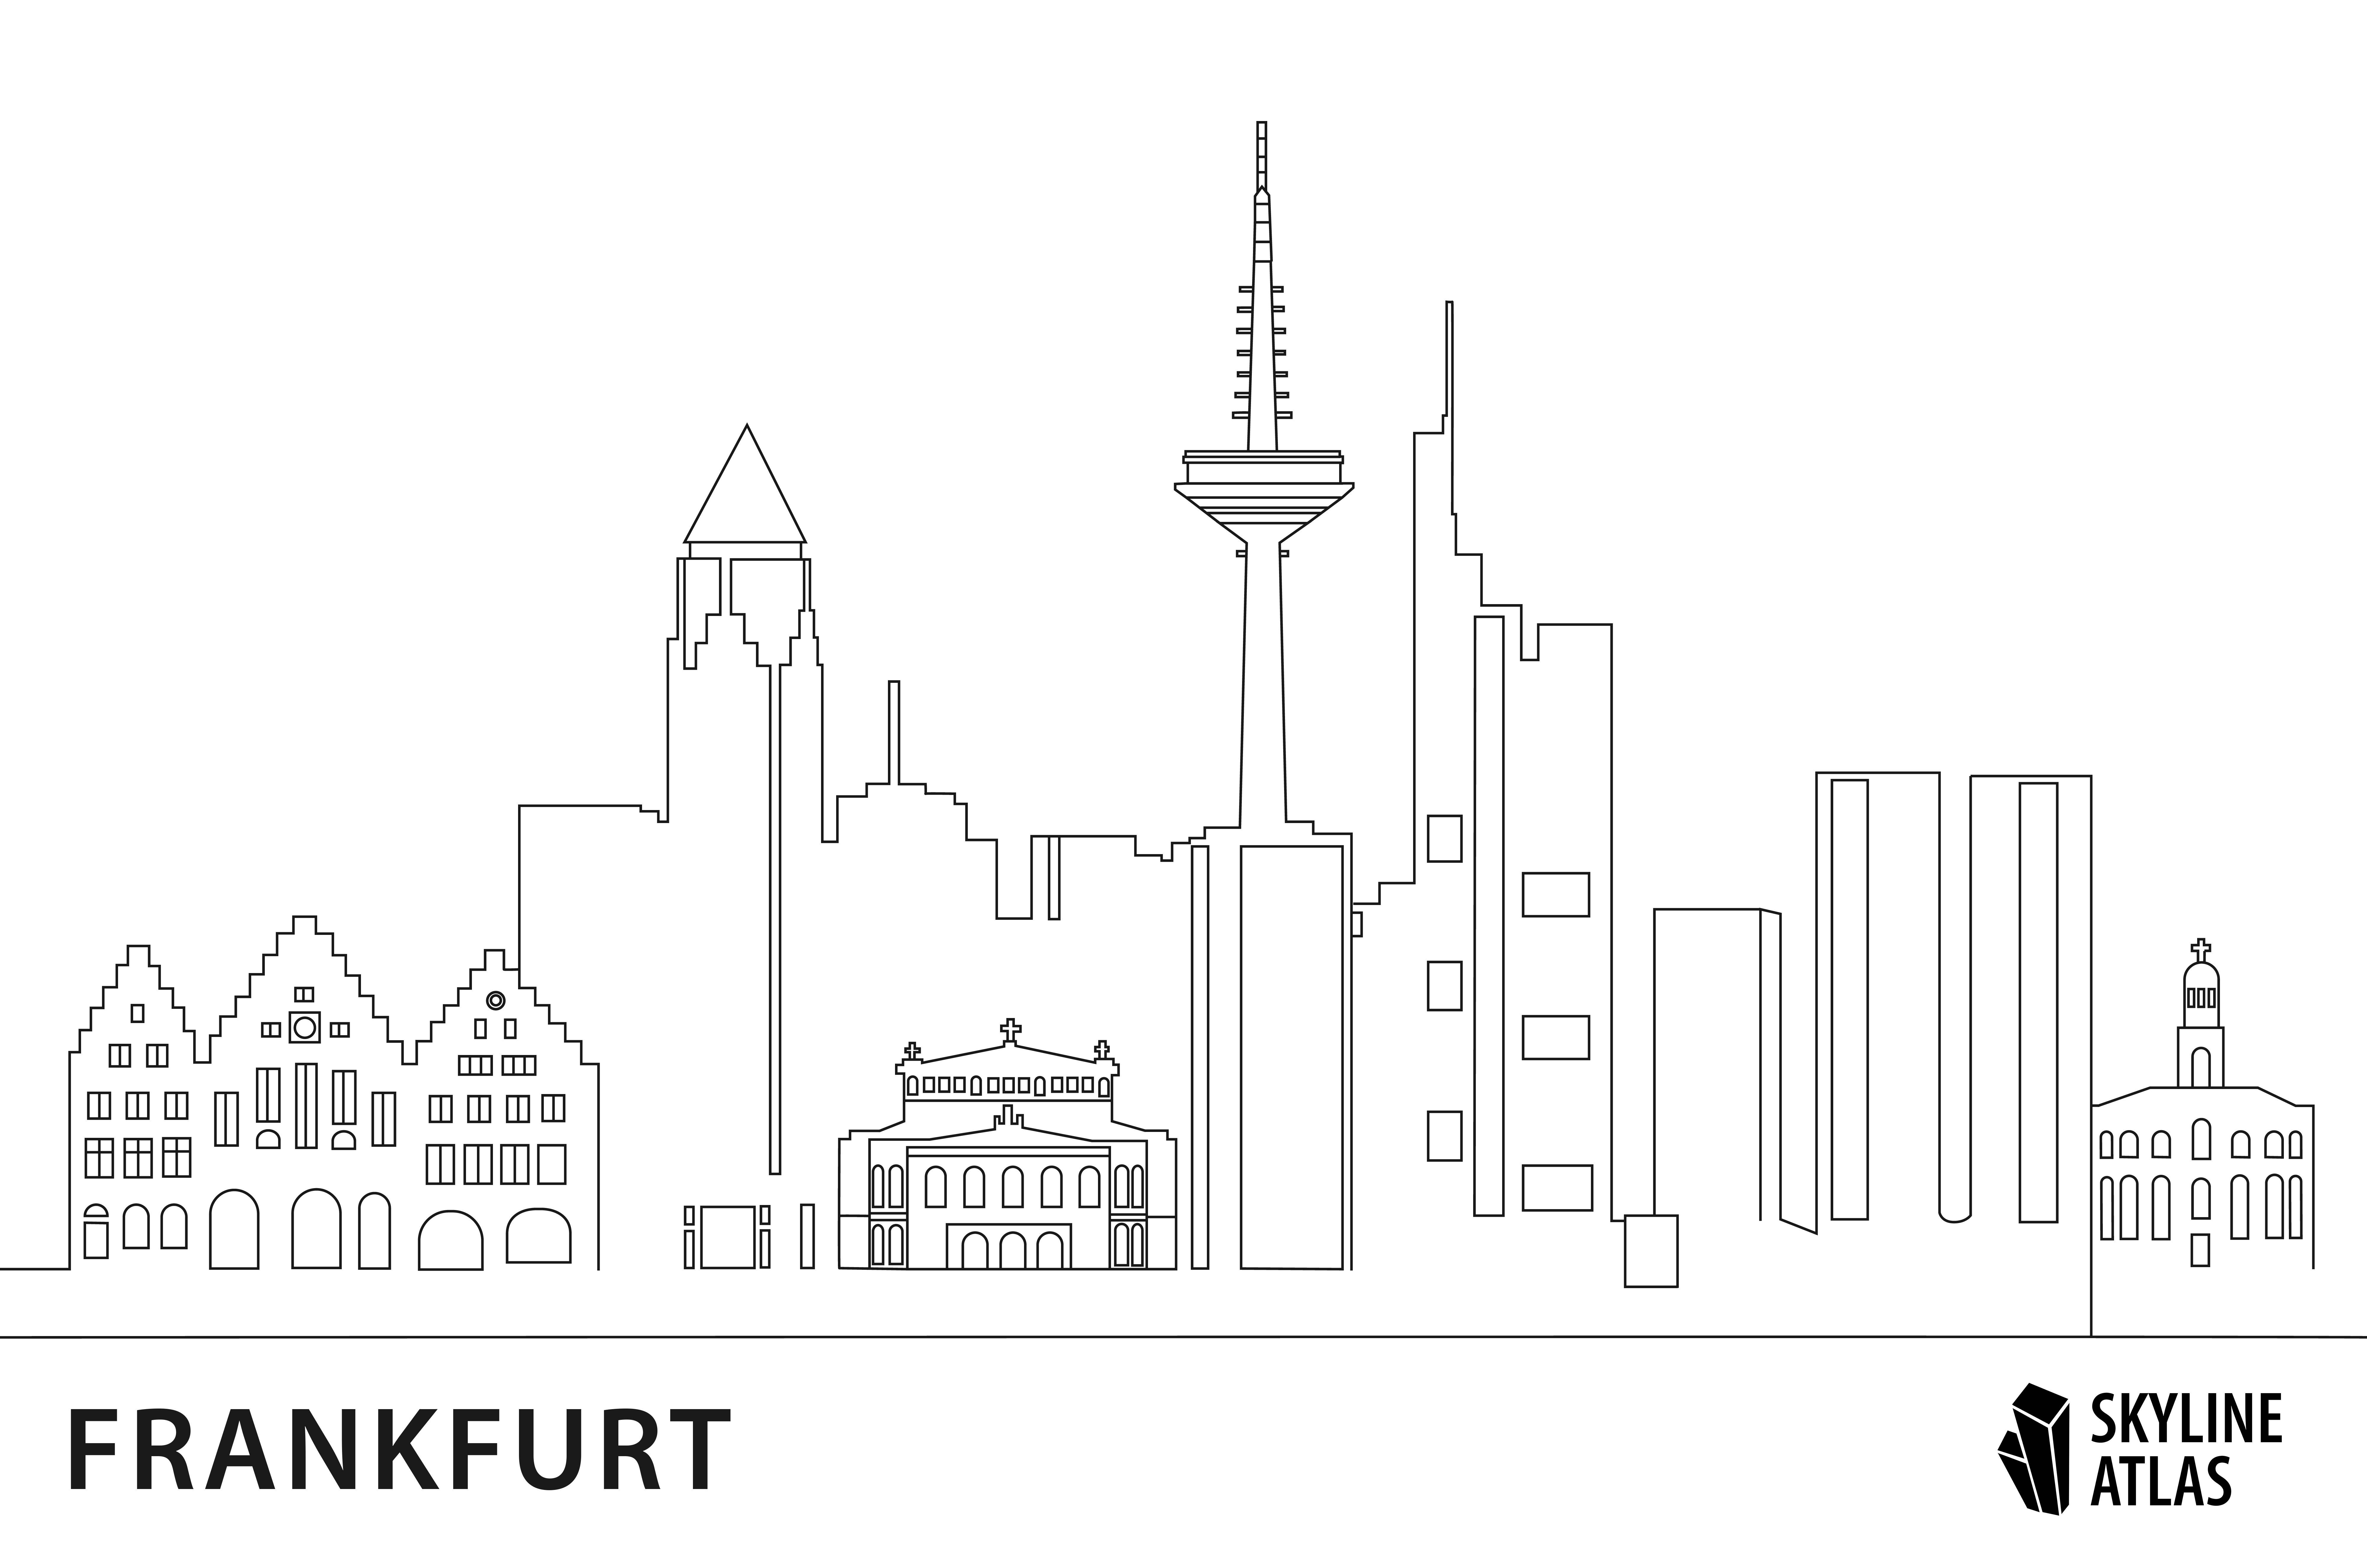 Ausmalbild Hochhäuser Frankfurt - Ausmalbilder Frankfurt